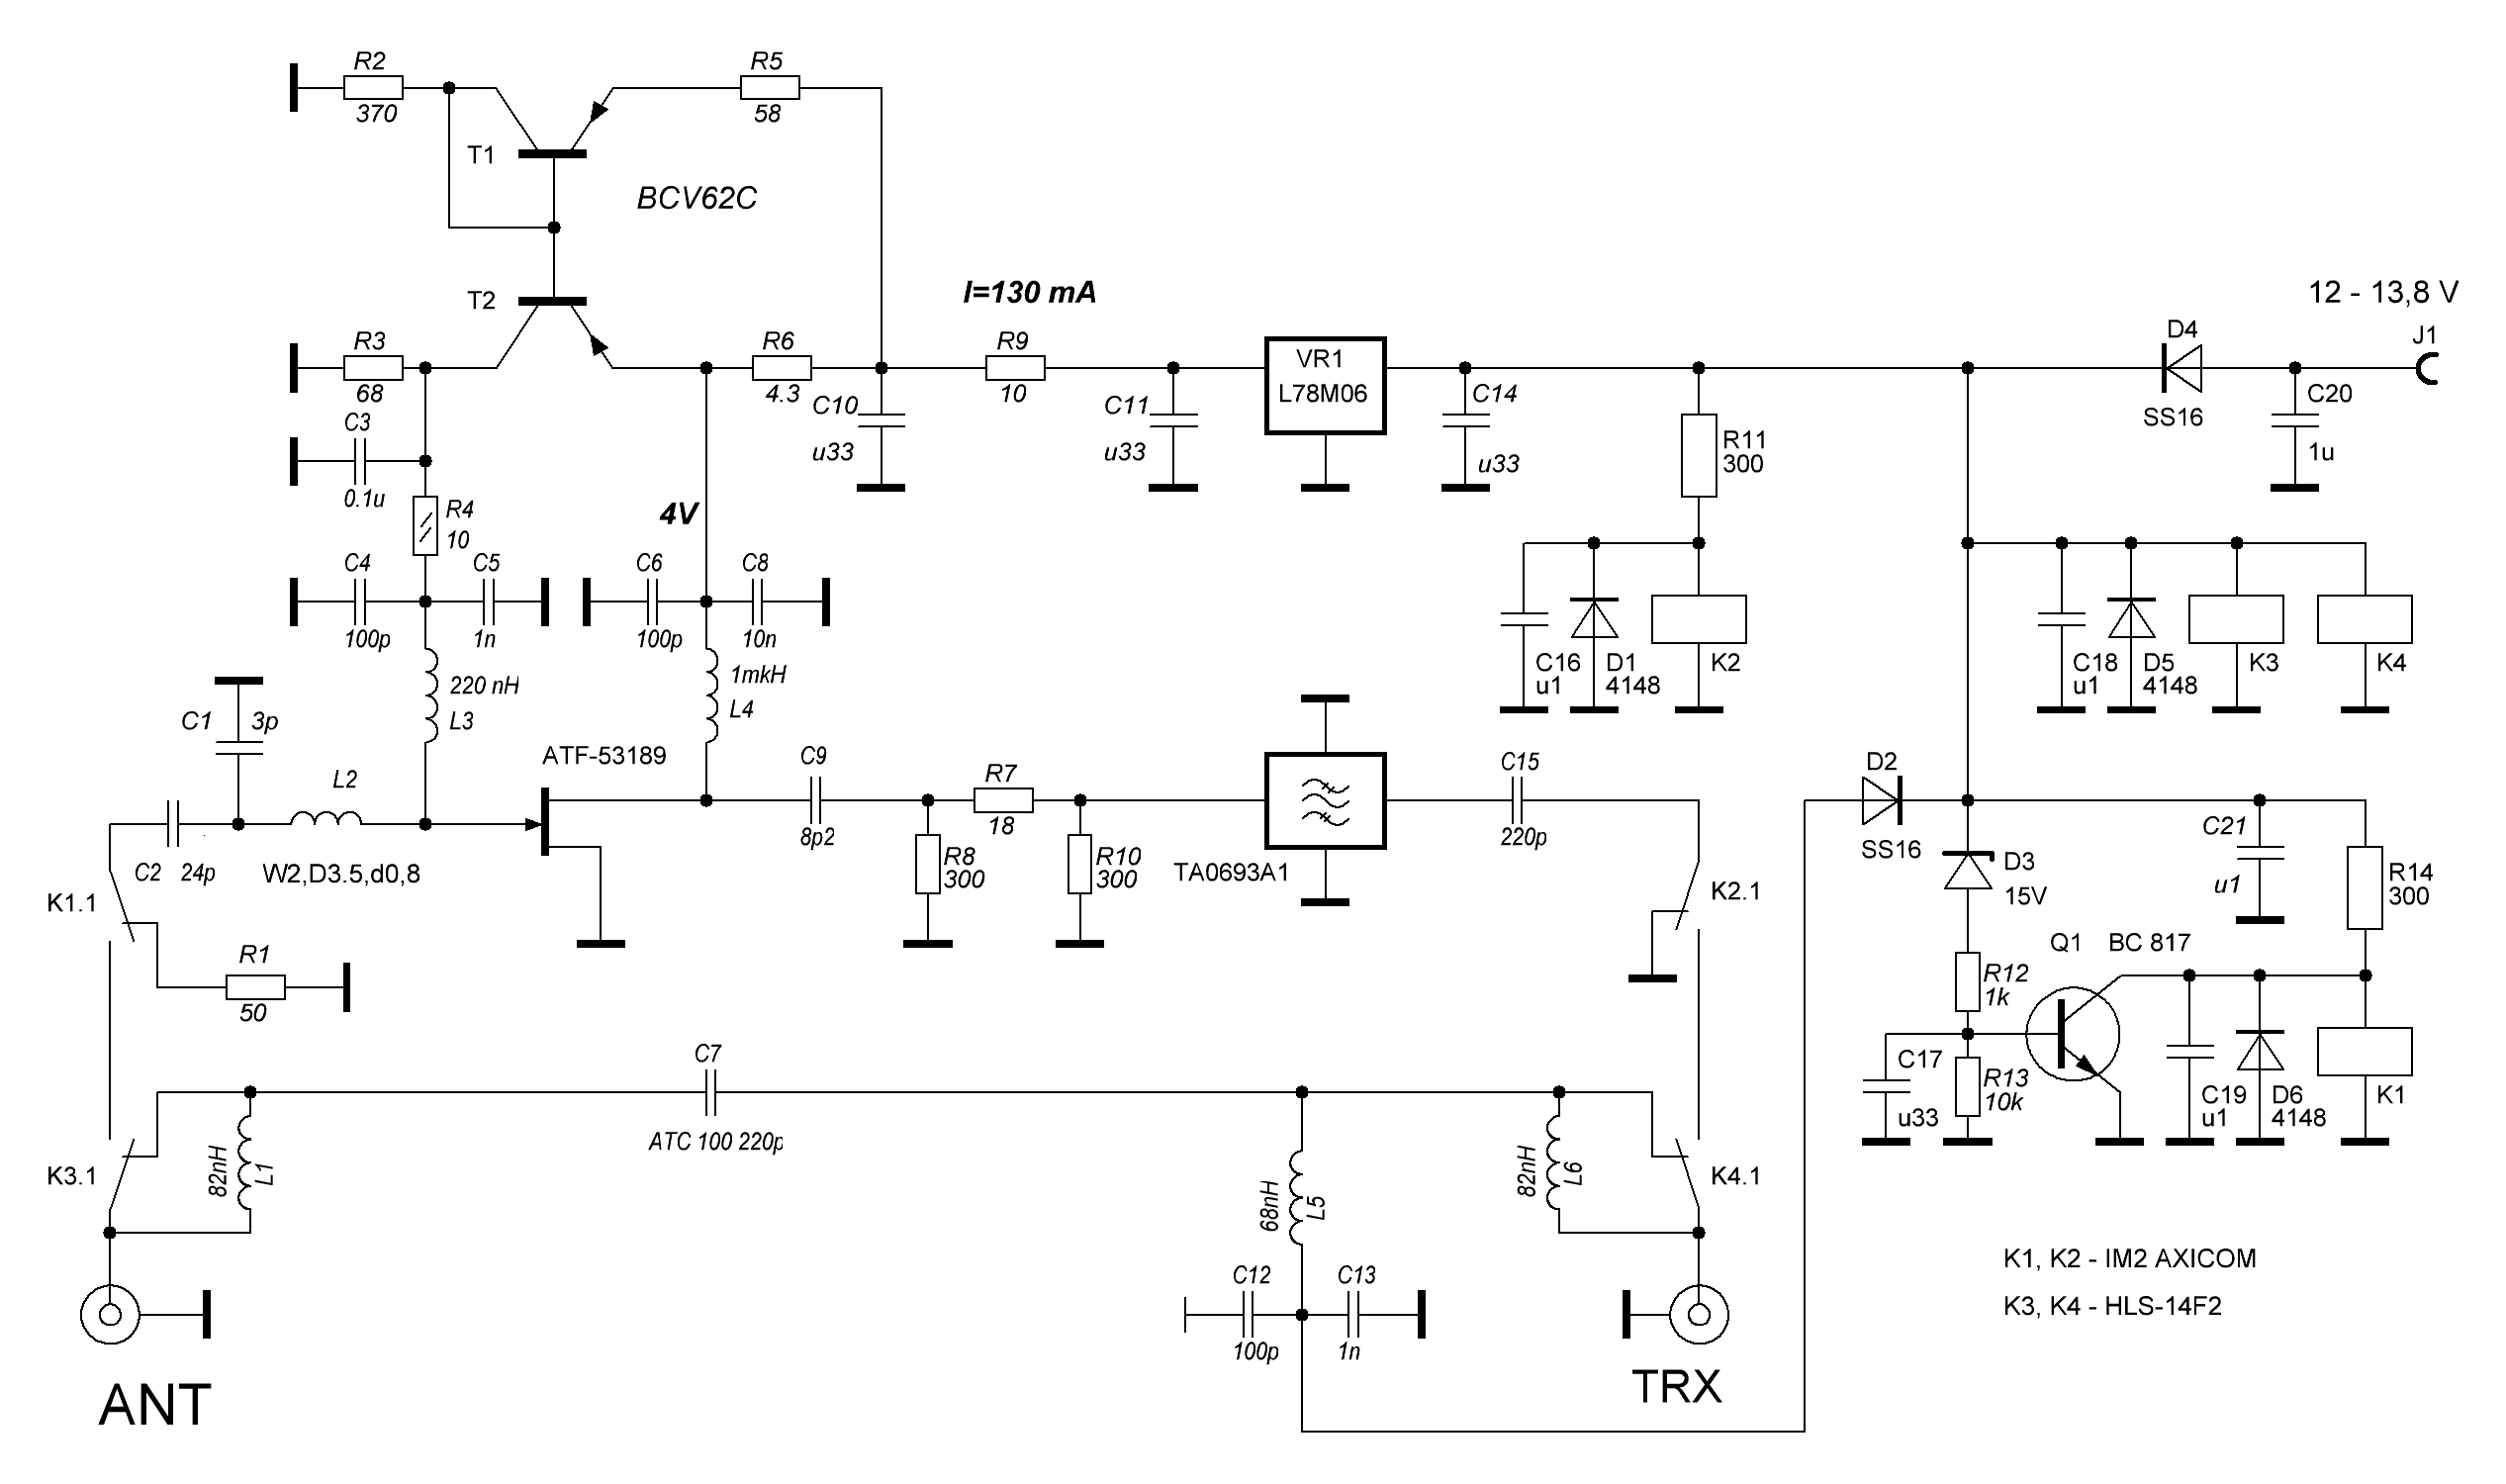 LNA 70cm QRO schematics revision from 2021-06-05